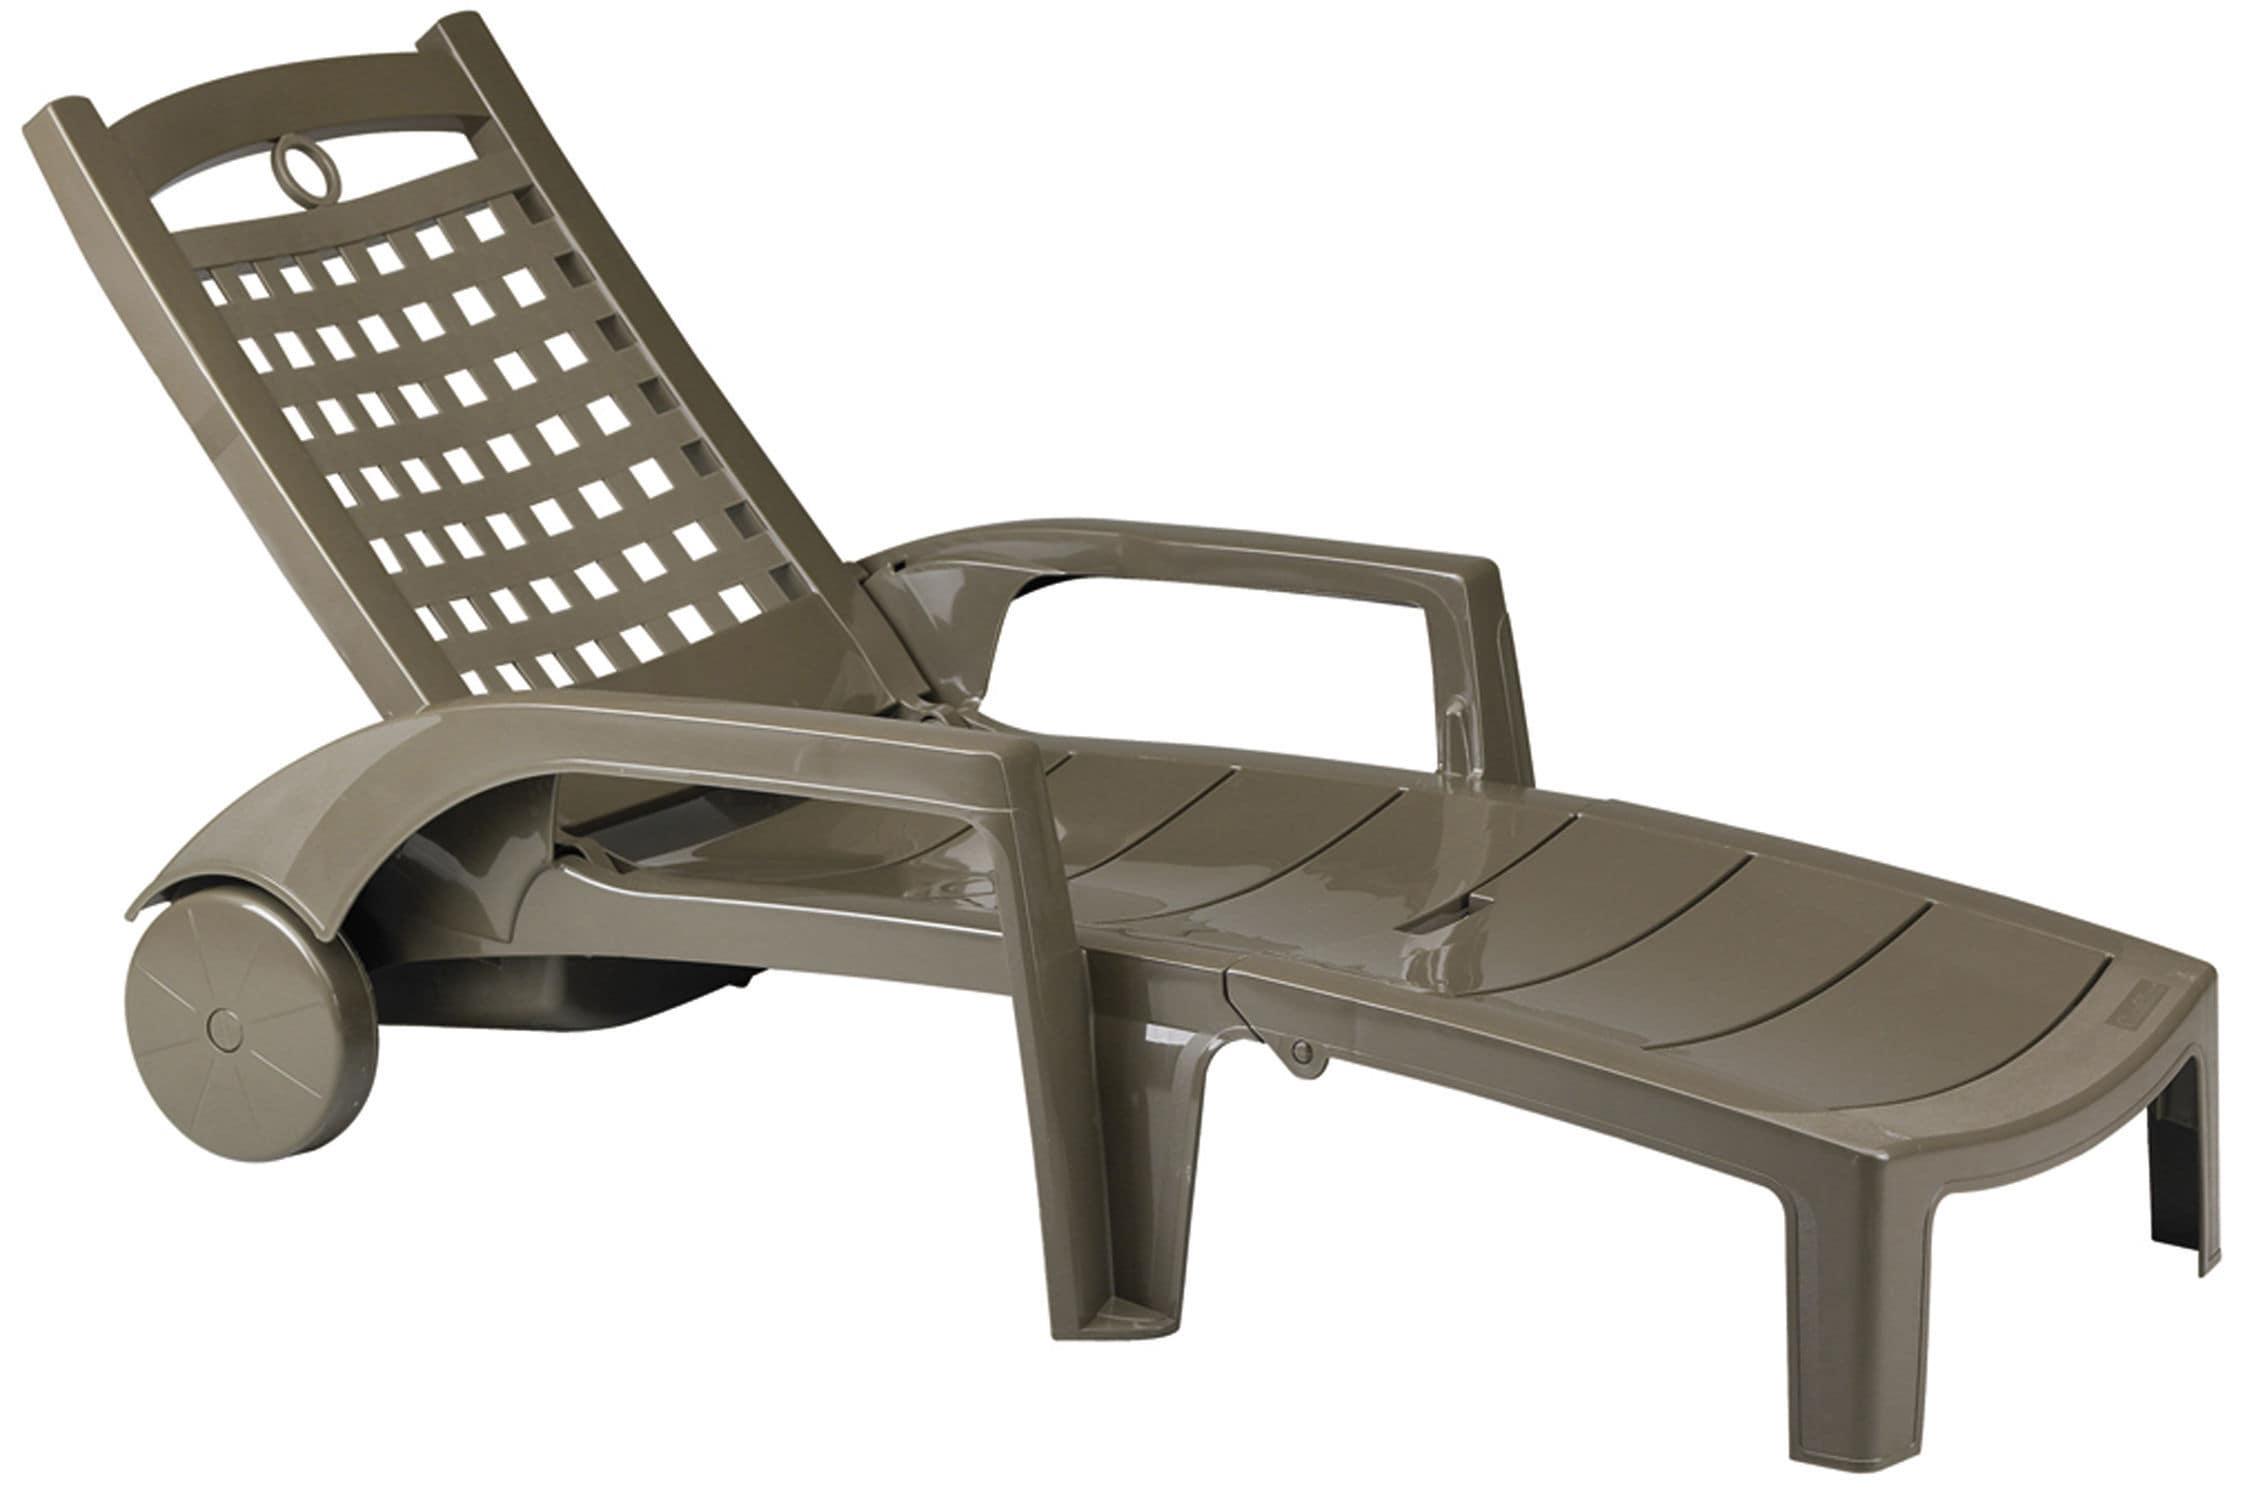 Outdoor chaise longue BORA GROSFILLEX fenªtres